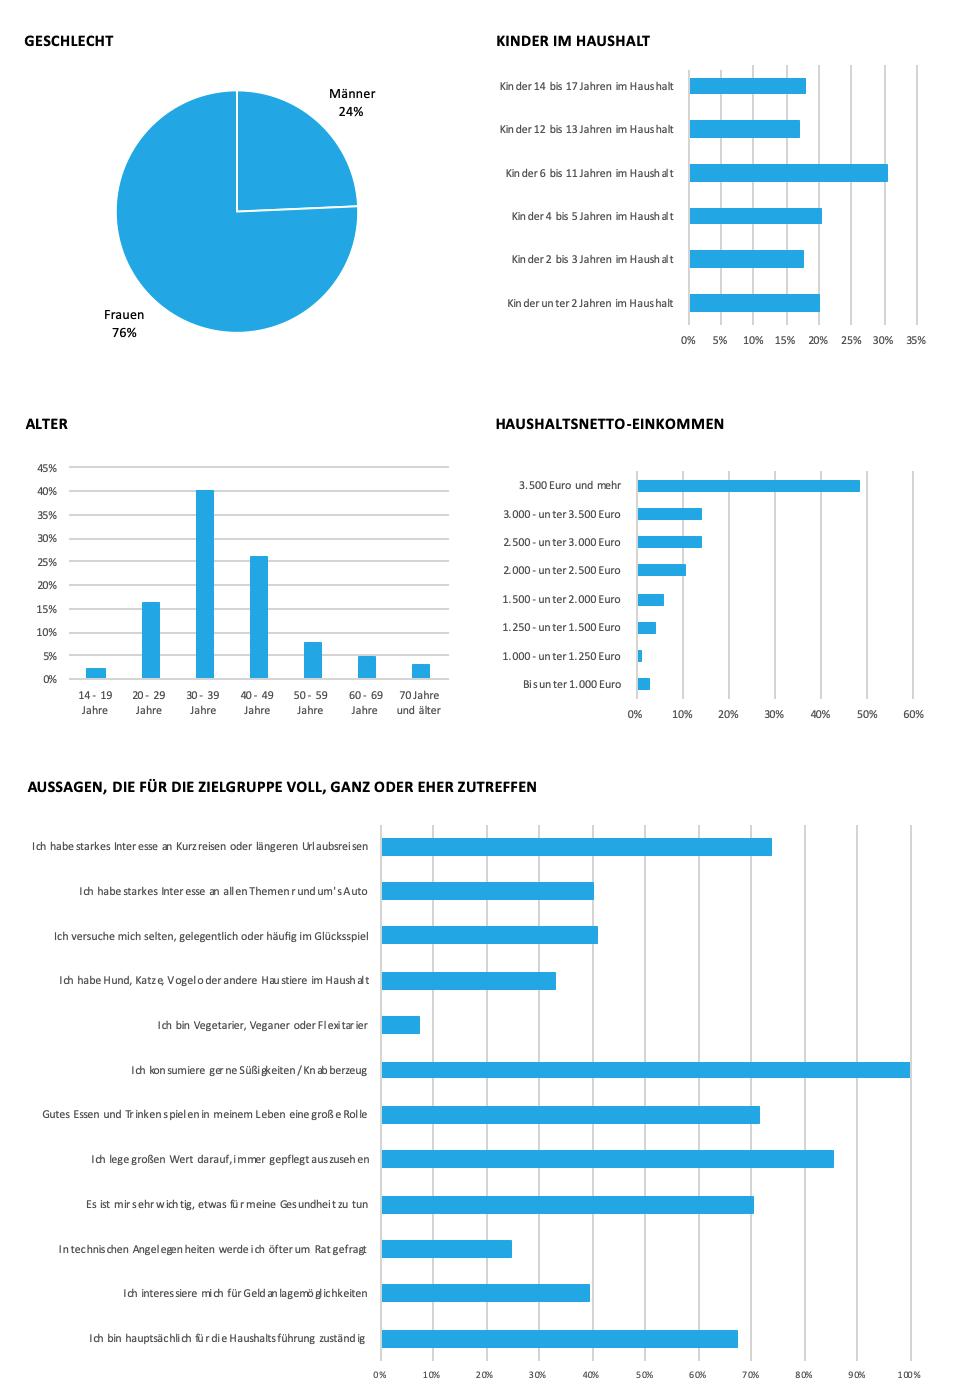 Soziodemografische Daten zu JAKO-O